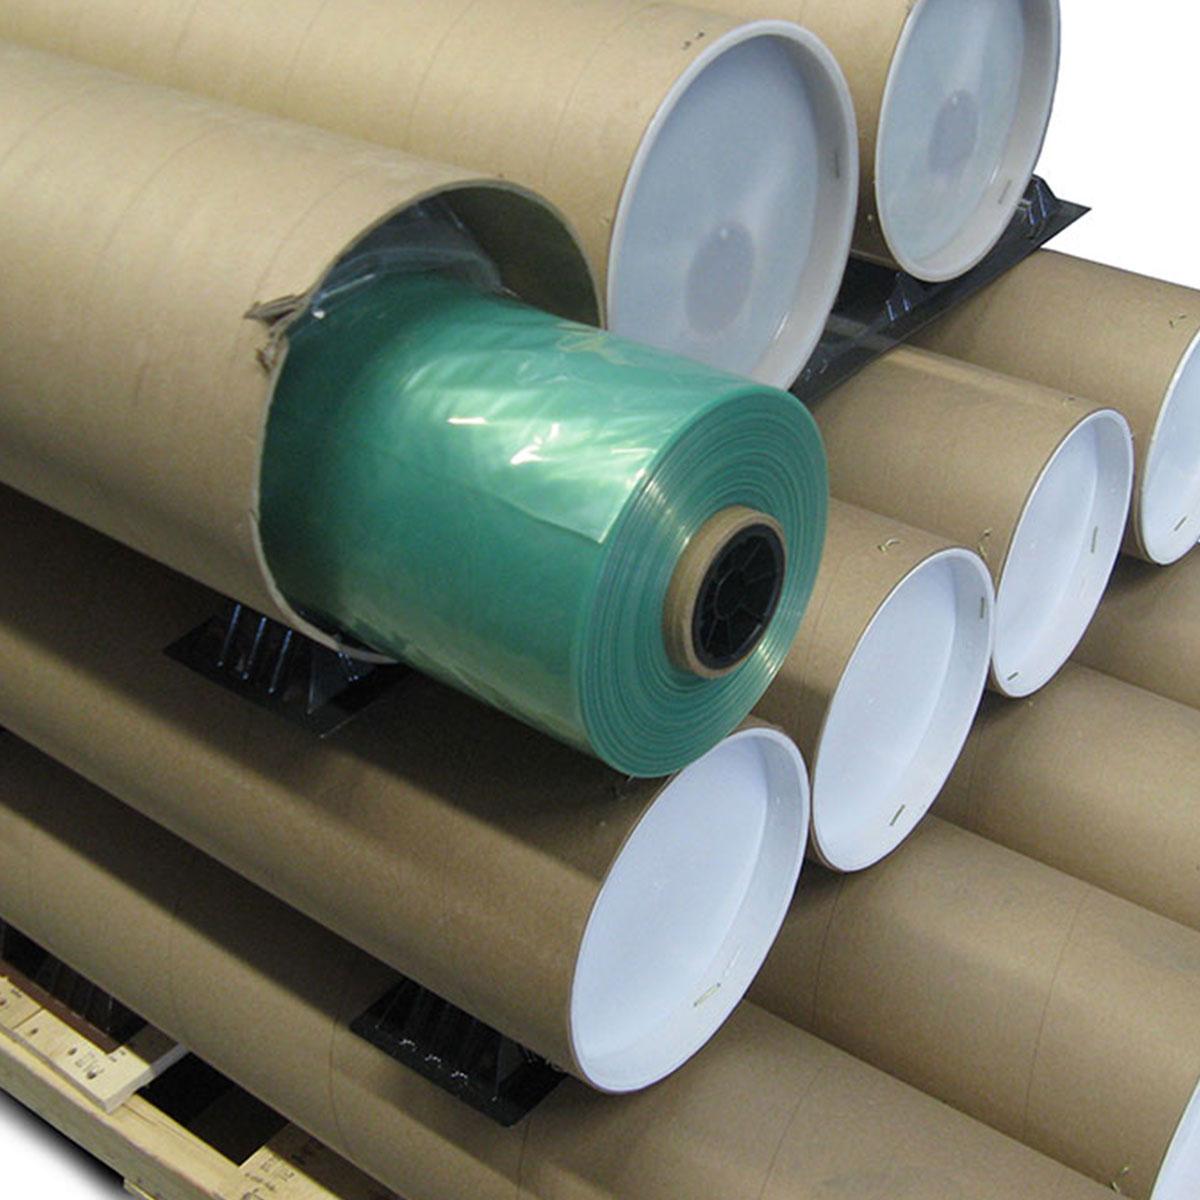 vakuum sack nylon 910 grn 0076mm x 910mm 4004m 0003 x 36